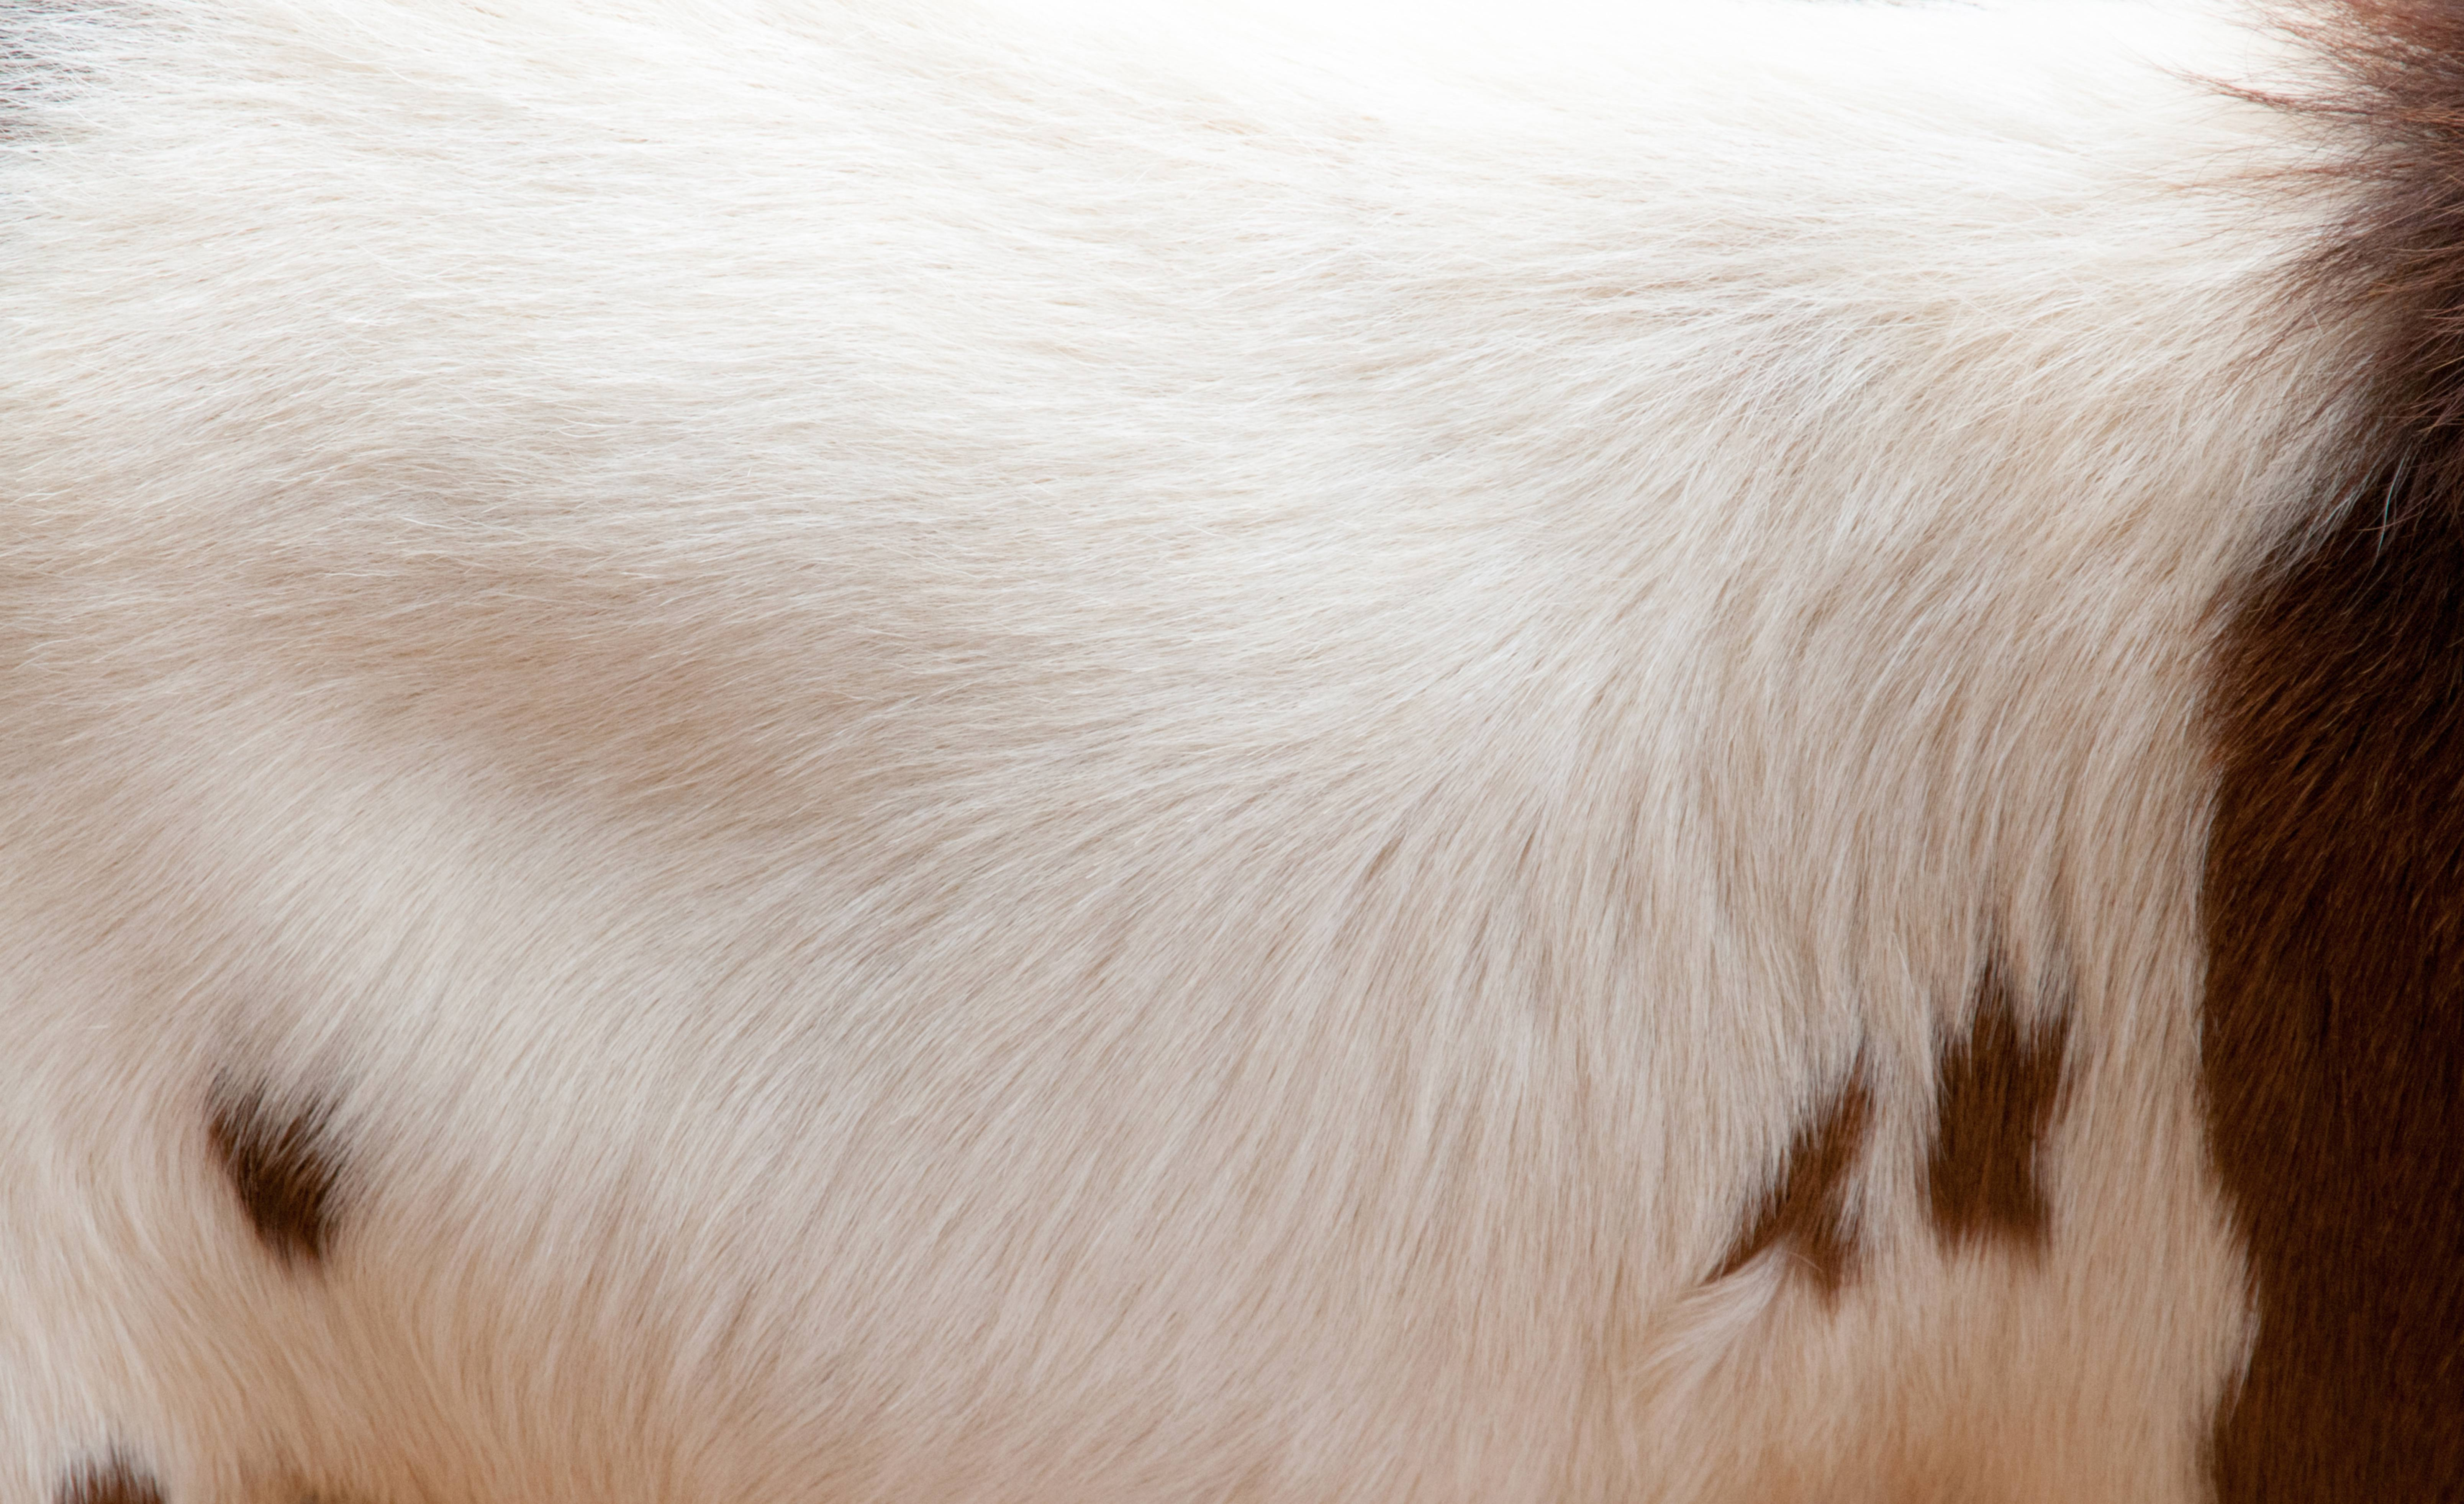 Brown Goat Fur Texture